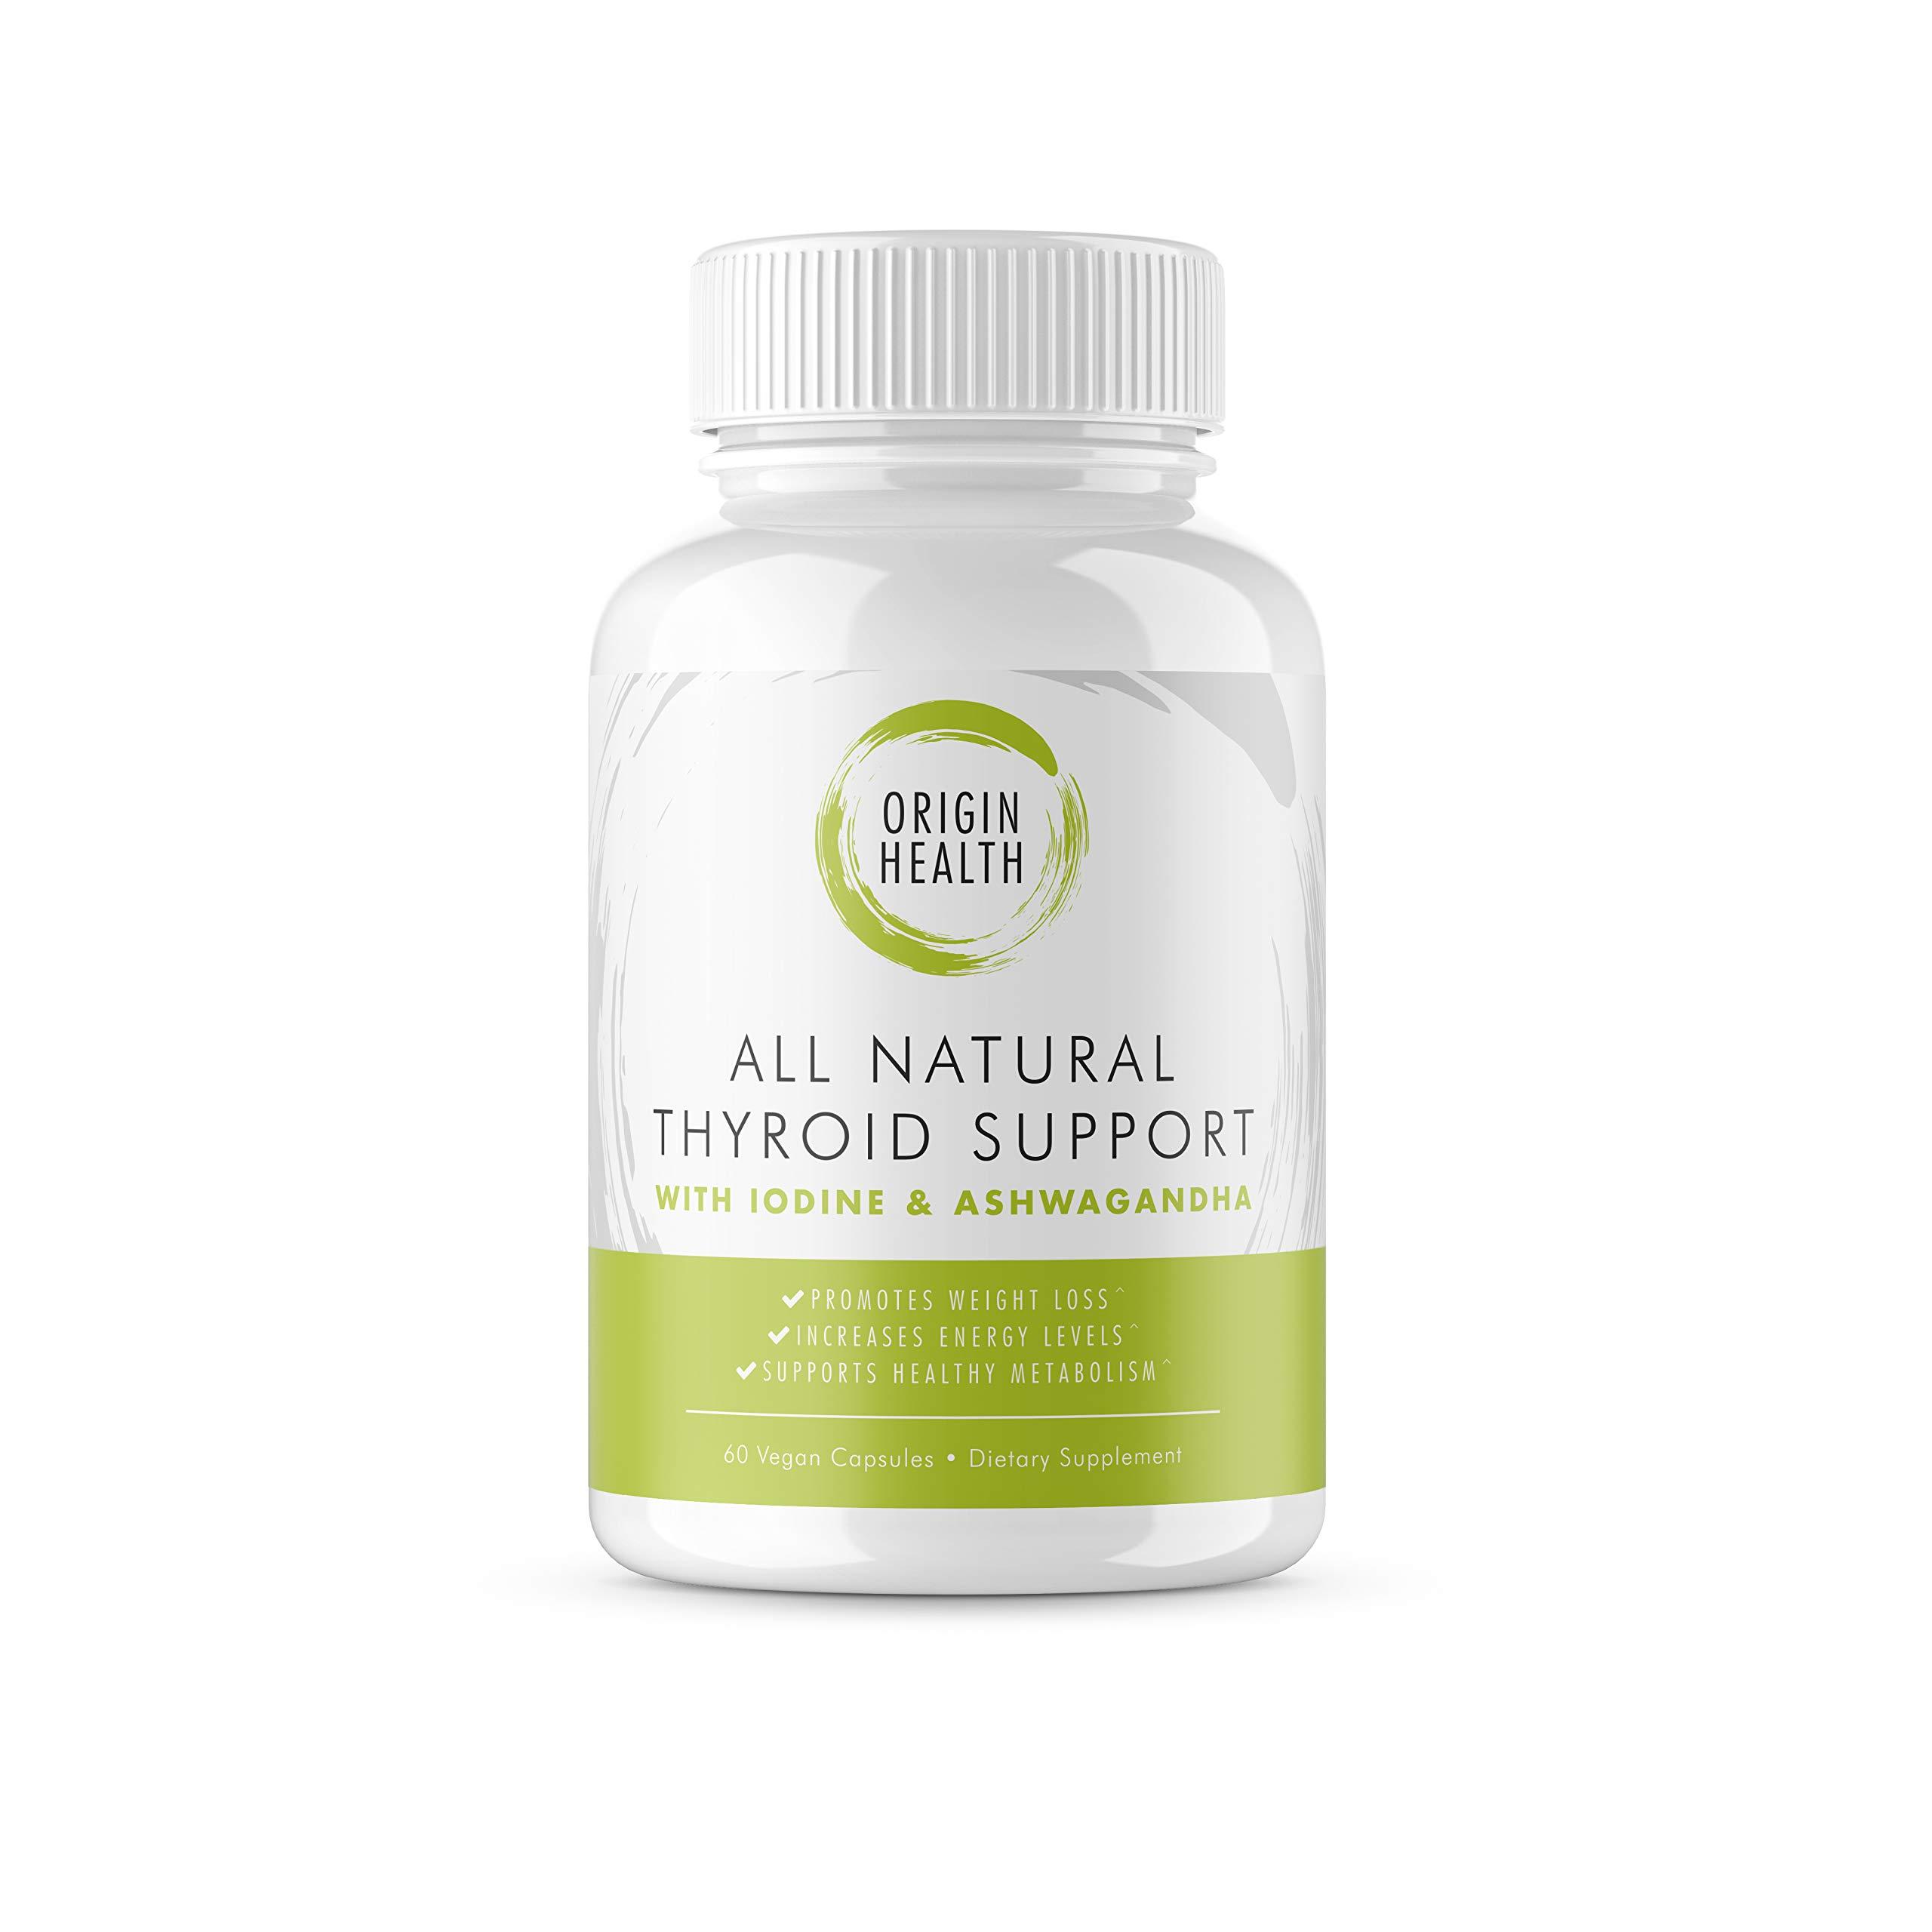 Thyroid Support Supplement *100% Money Back Guarantee* 50% Better Value * Metabolism, Energy and Focus Formula - Vegetarian & Non-GMO - Vitamin B12 Complex, Zinc, Selenium, Ashwagandha - 60ct.